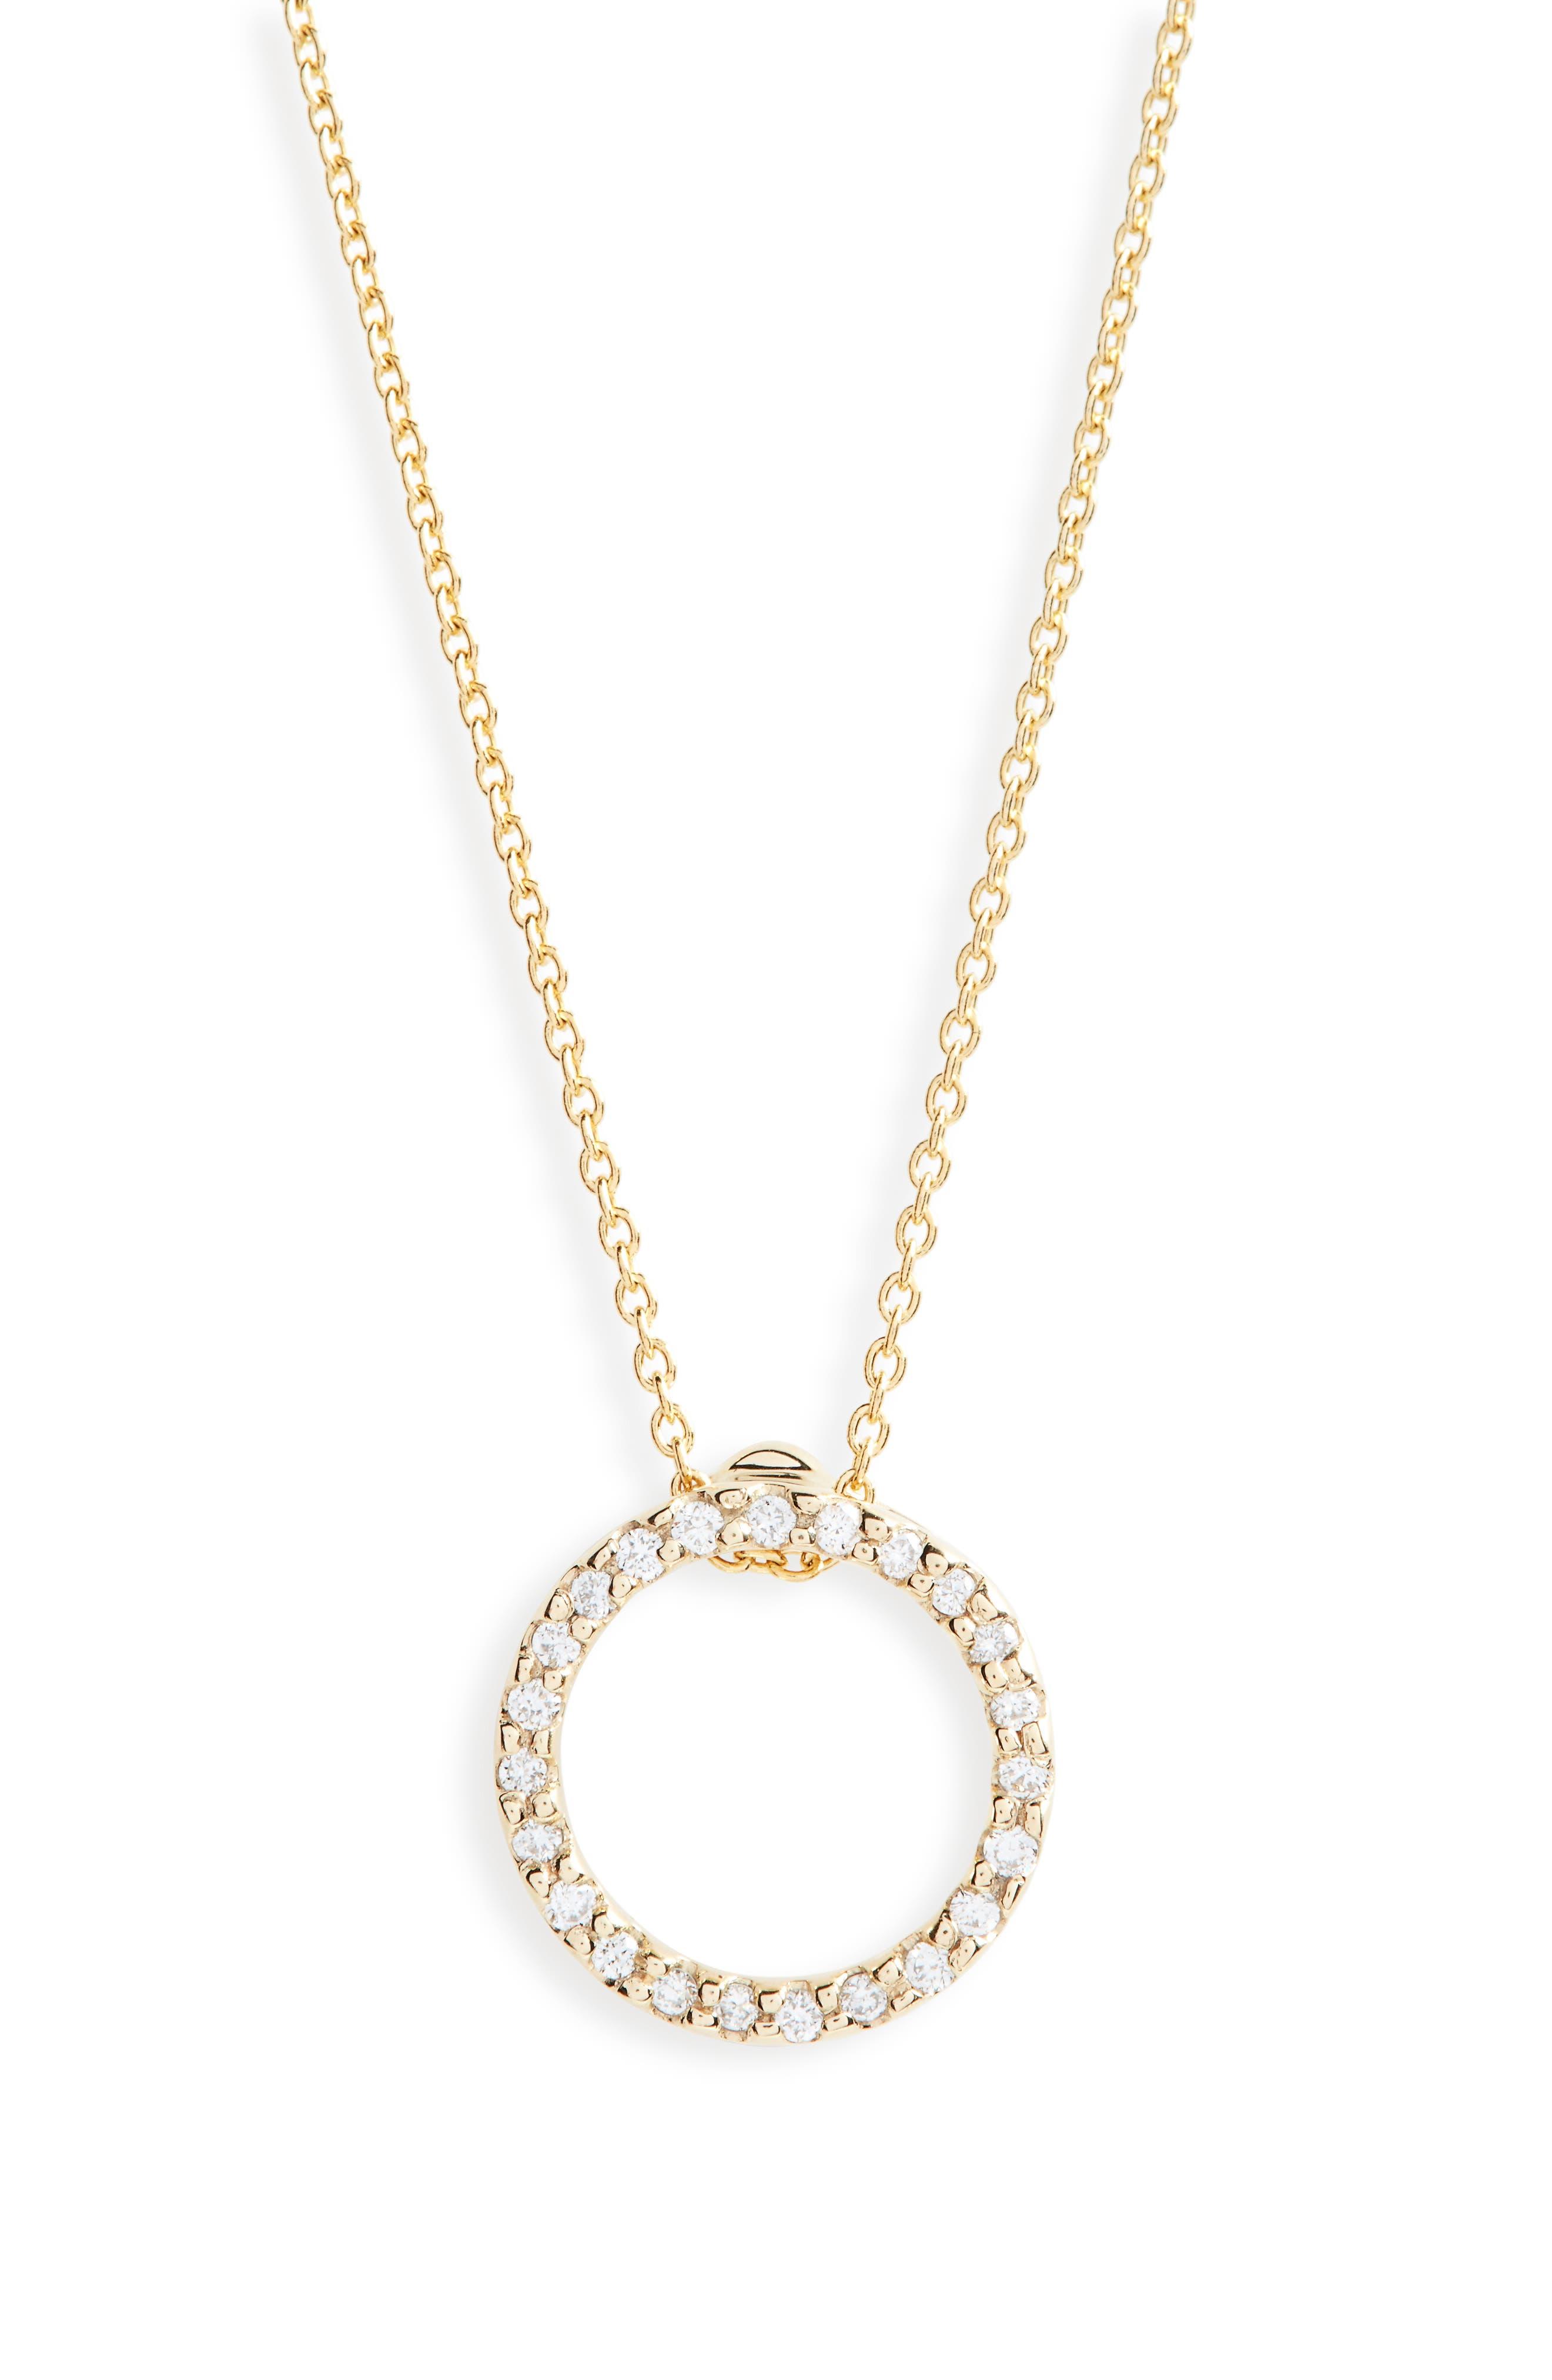 XS Diamond Pendant Necklace,                         Main,                         color, D0.12 GHSI 18KYG